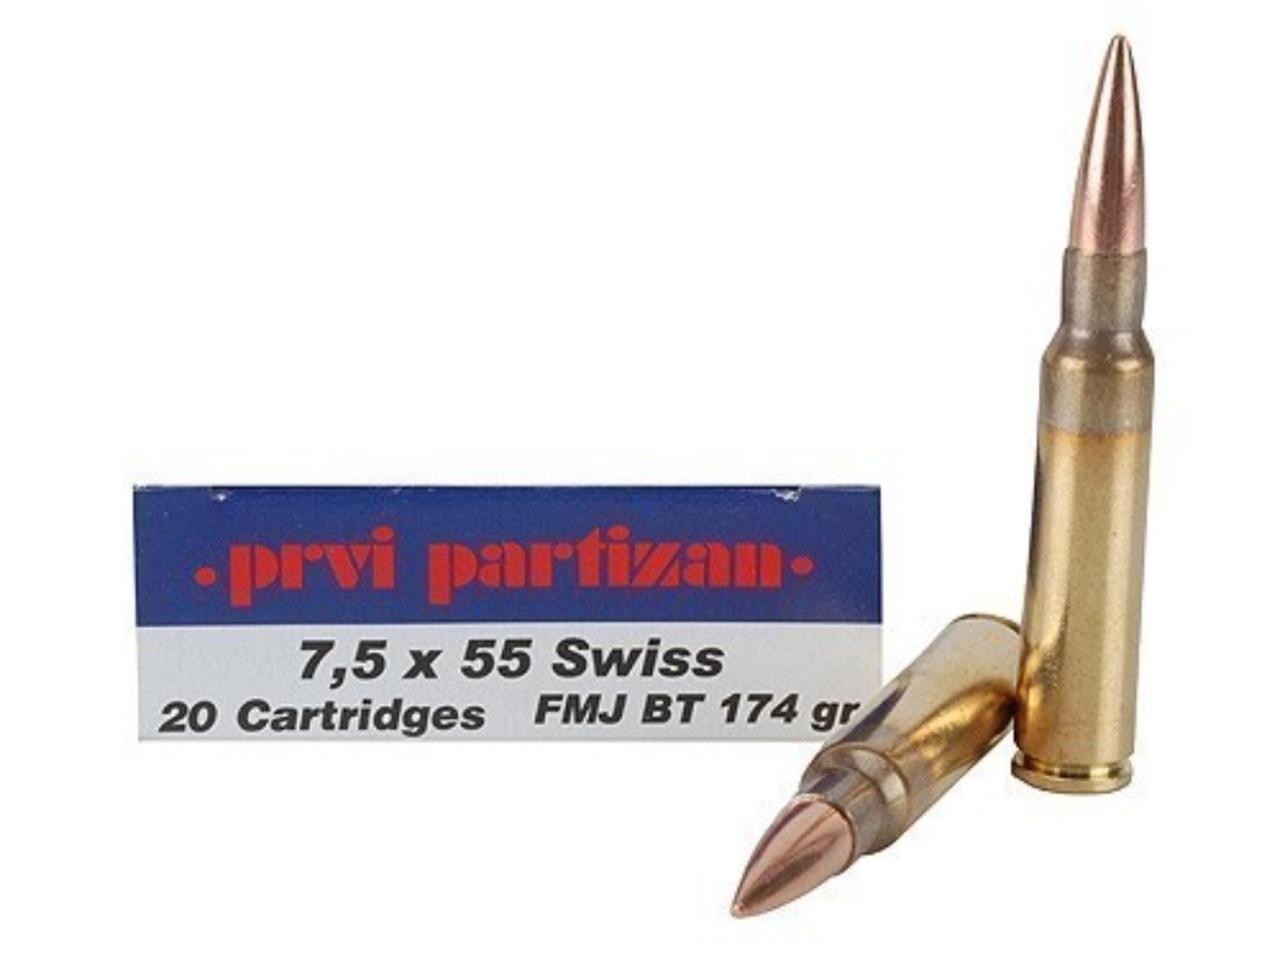 7 5x55 swiss 174 grain fmj bt prvi partizan ammunition in stock